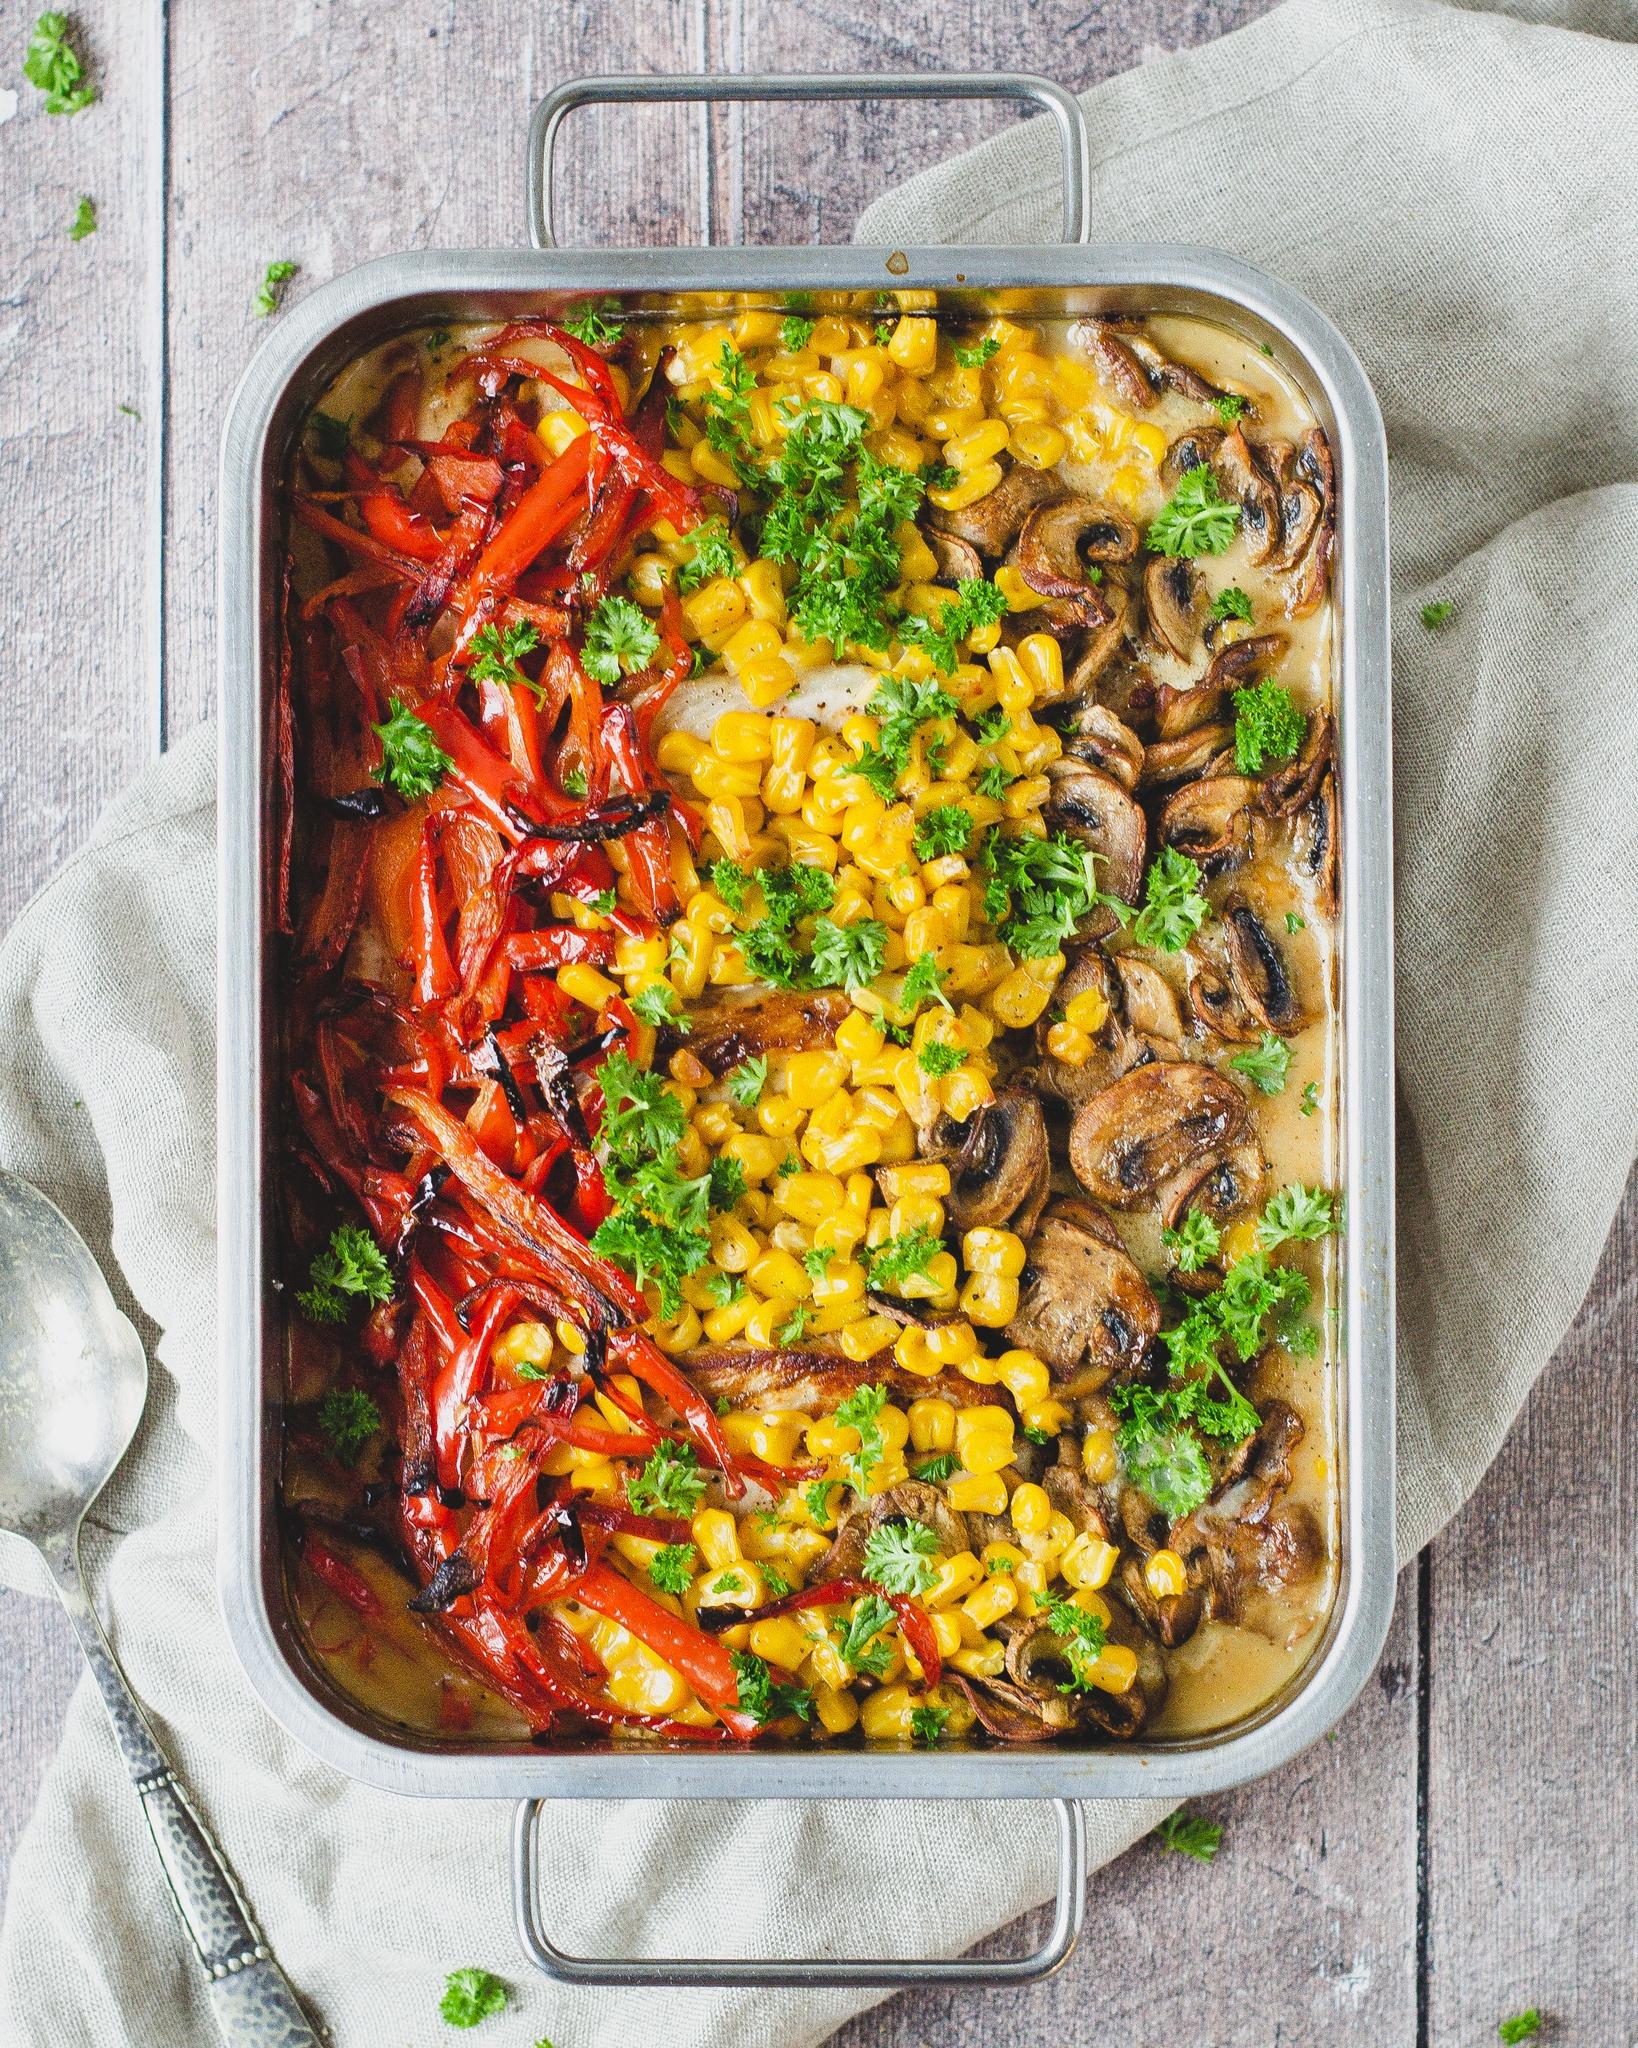 Koteletter i fad med grøntsager - rød peberfrugt, majs, champignoner